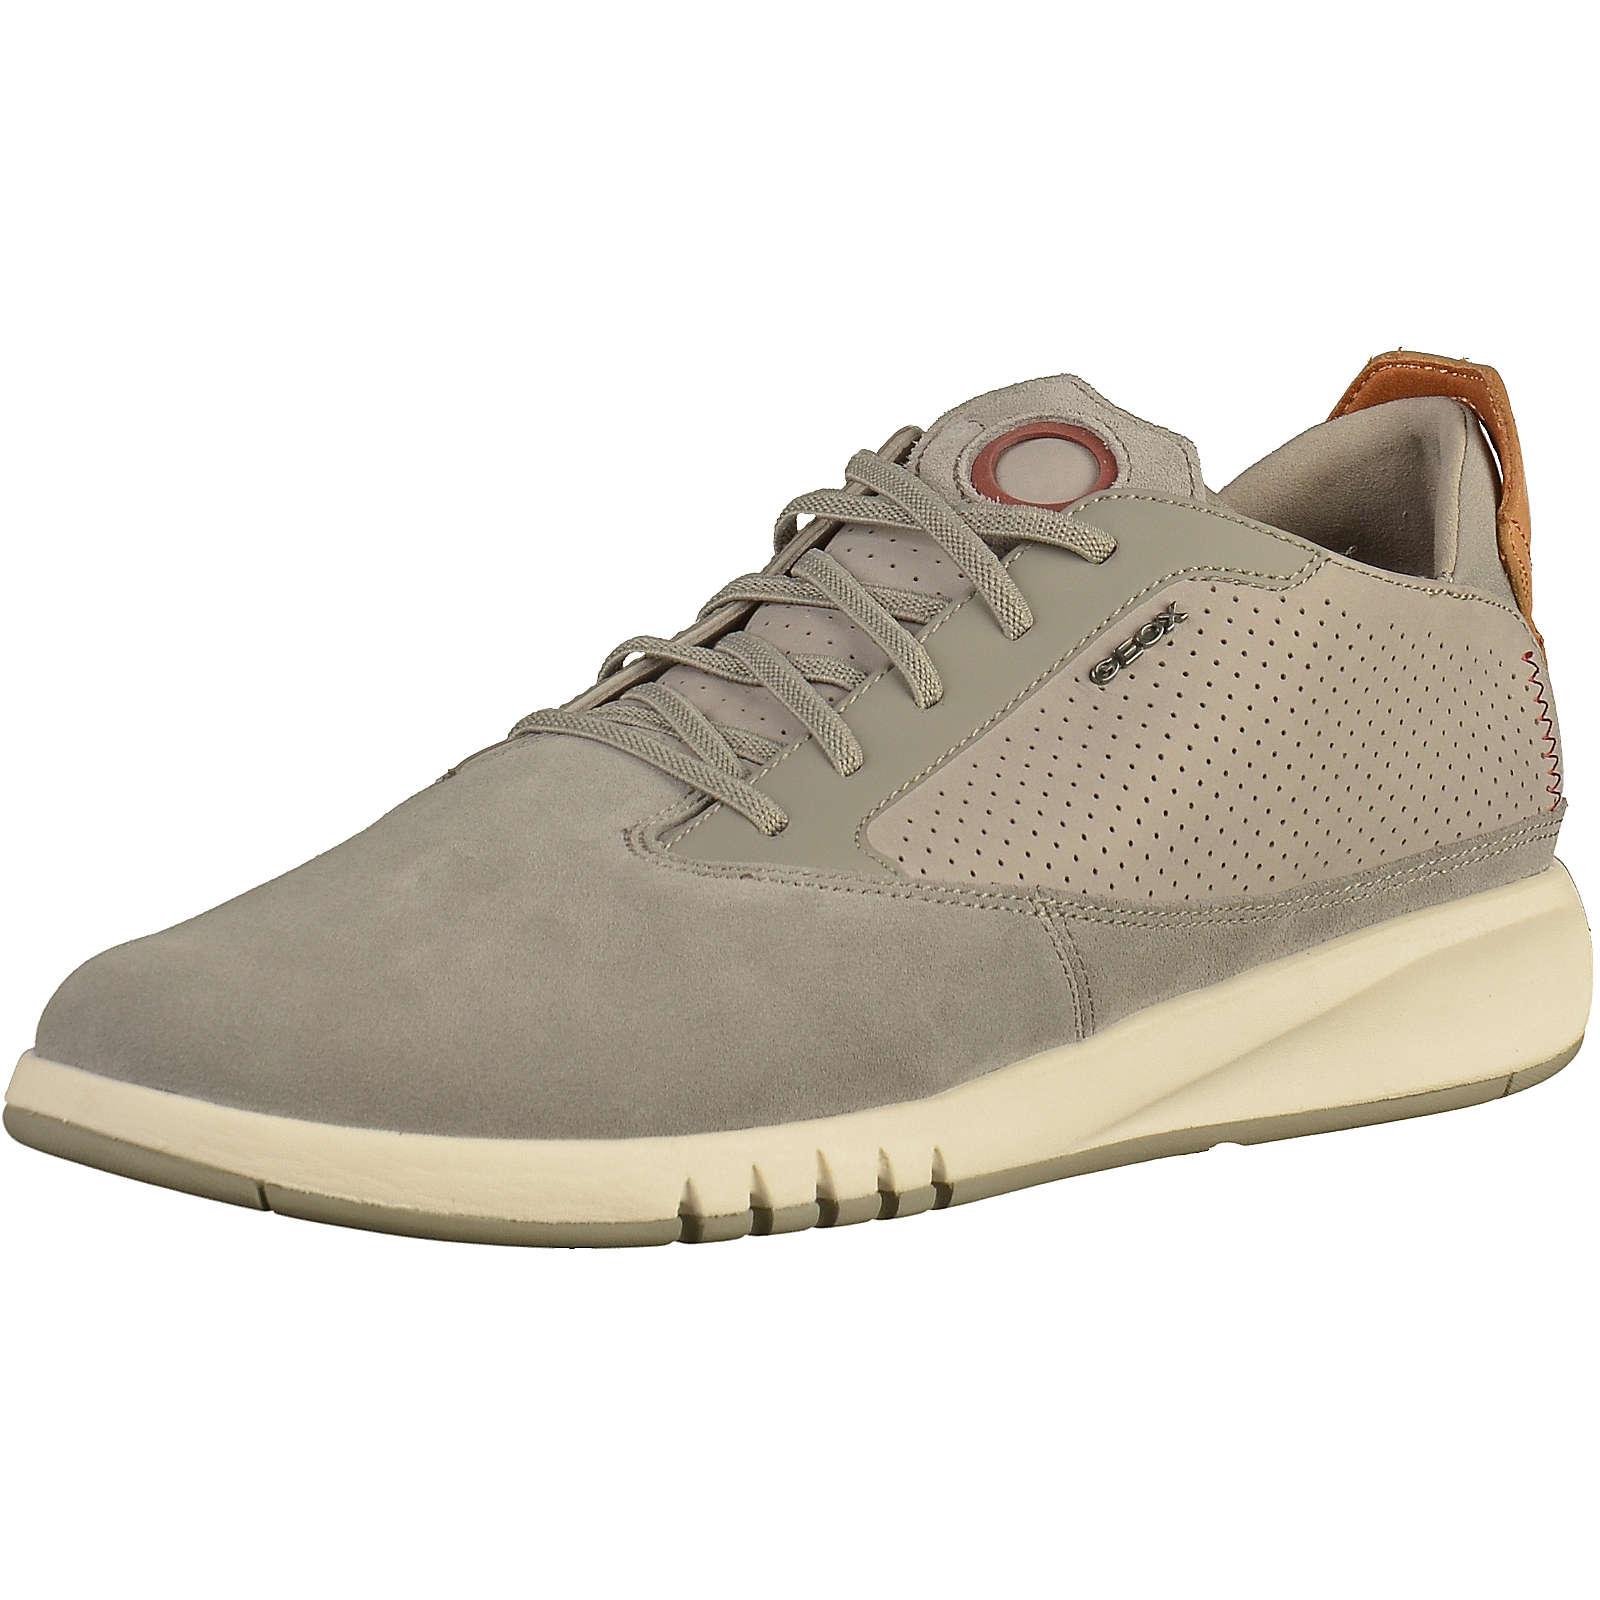 GEOX Sneaker Sneakers Low grau Herren Gr. 41